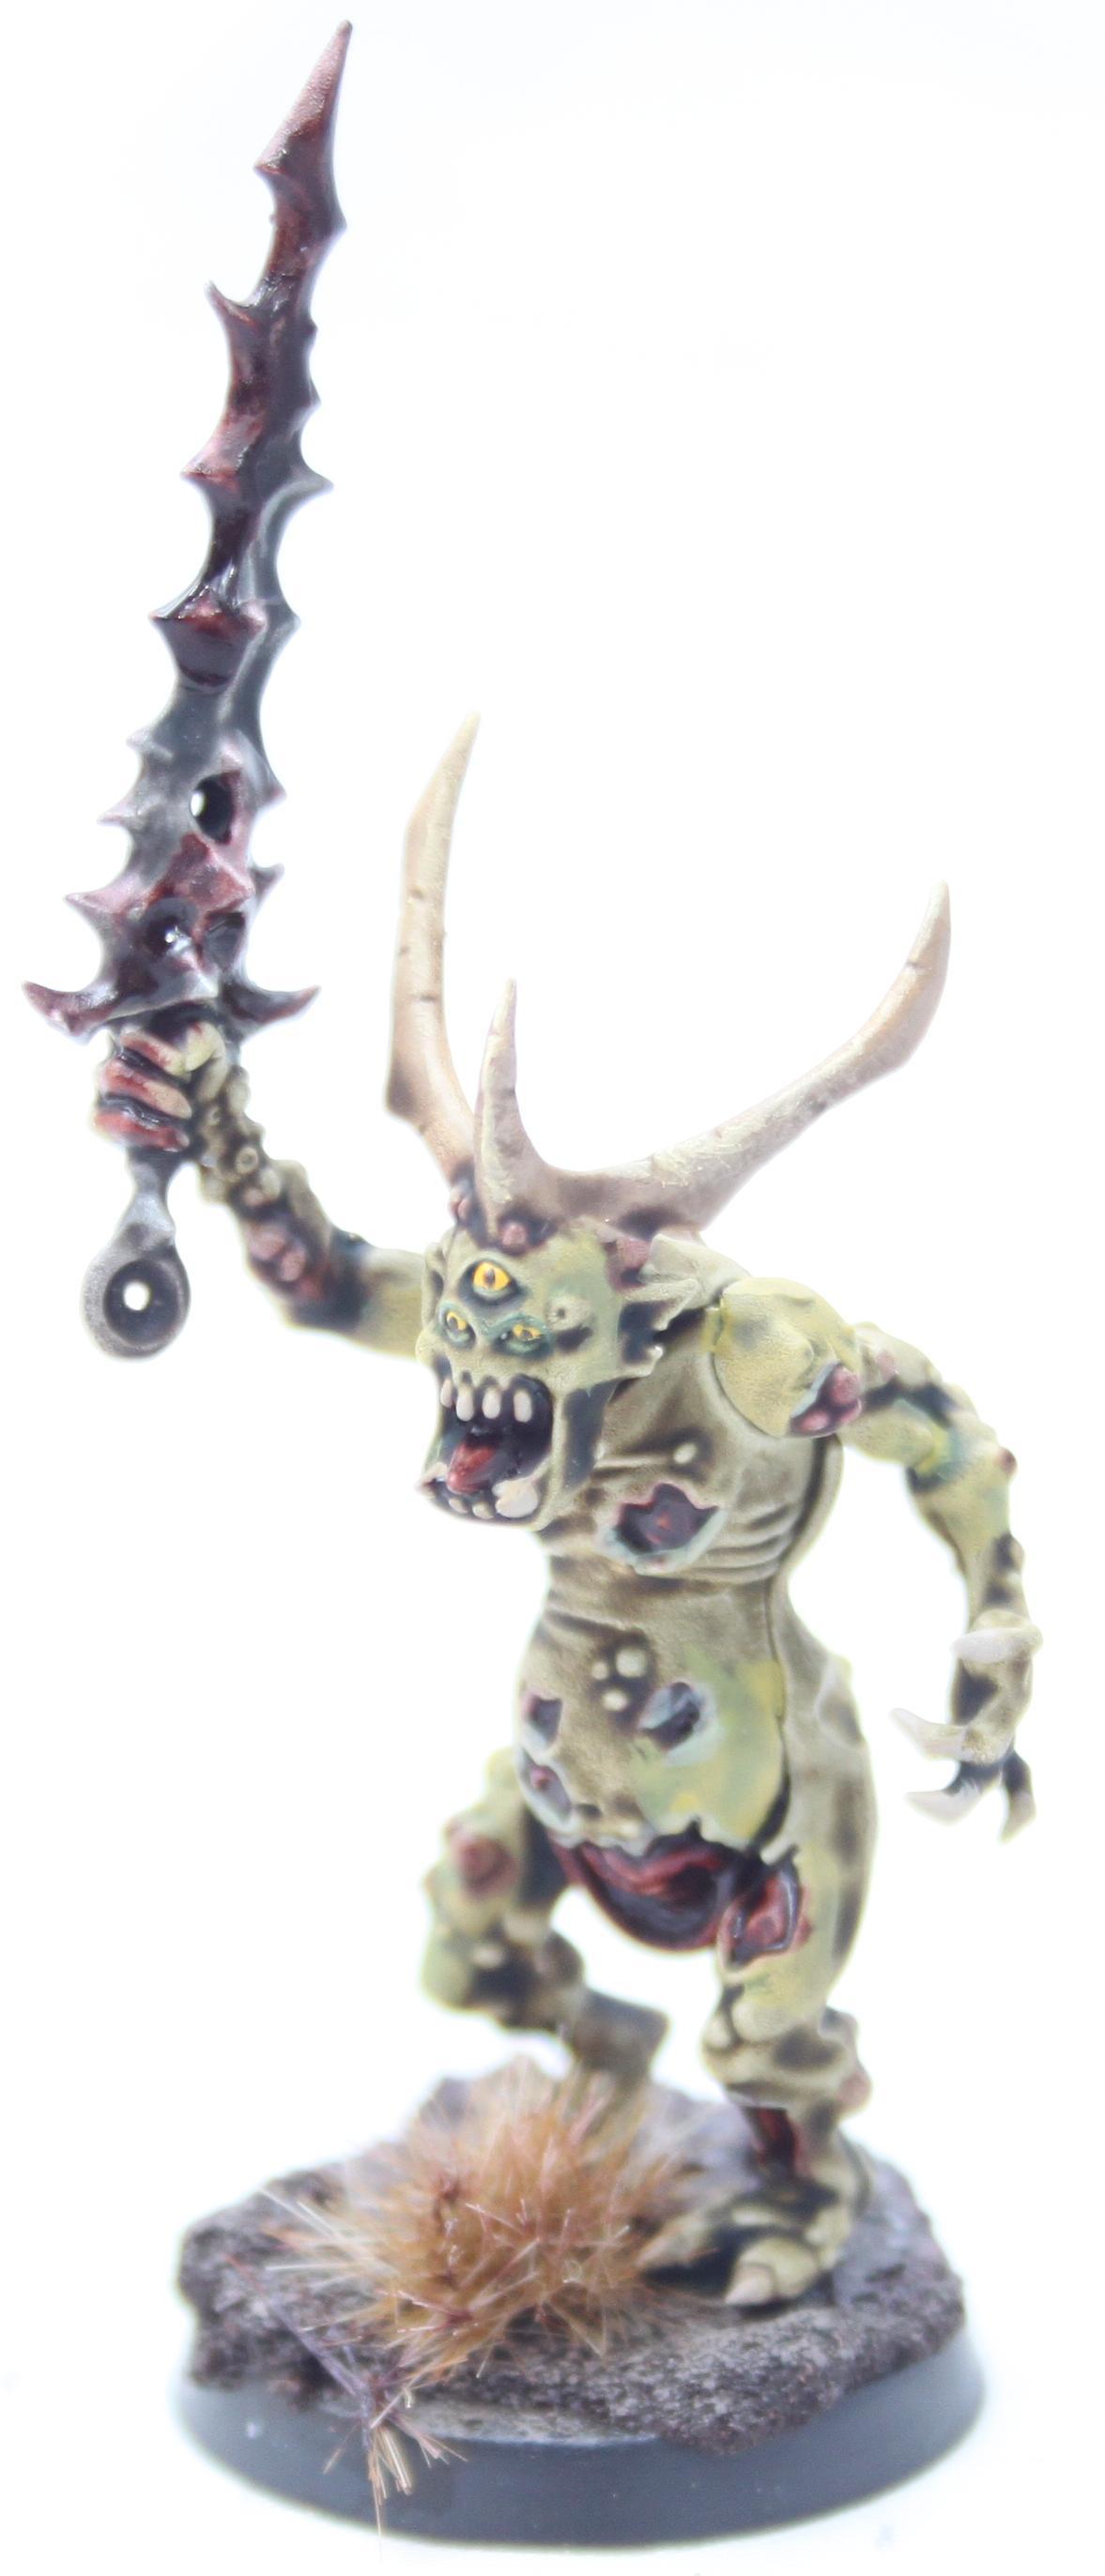 Daemons, Nurgle, Plague, Warhammer 40,000, Warhammer Fantasy